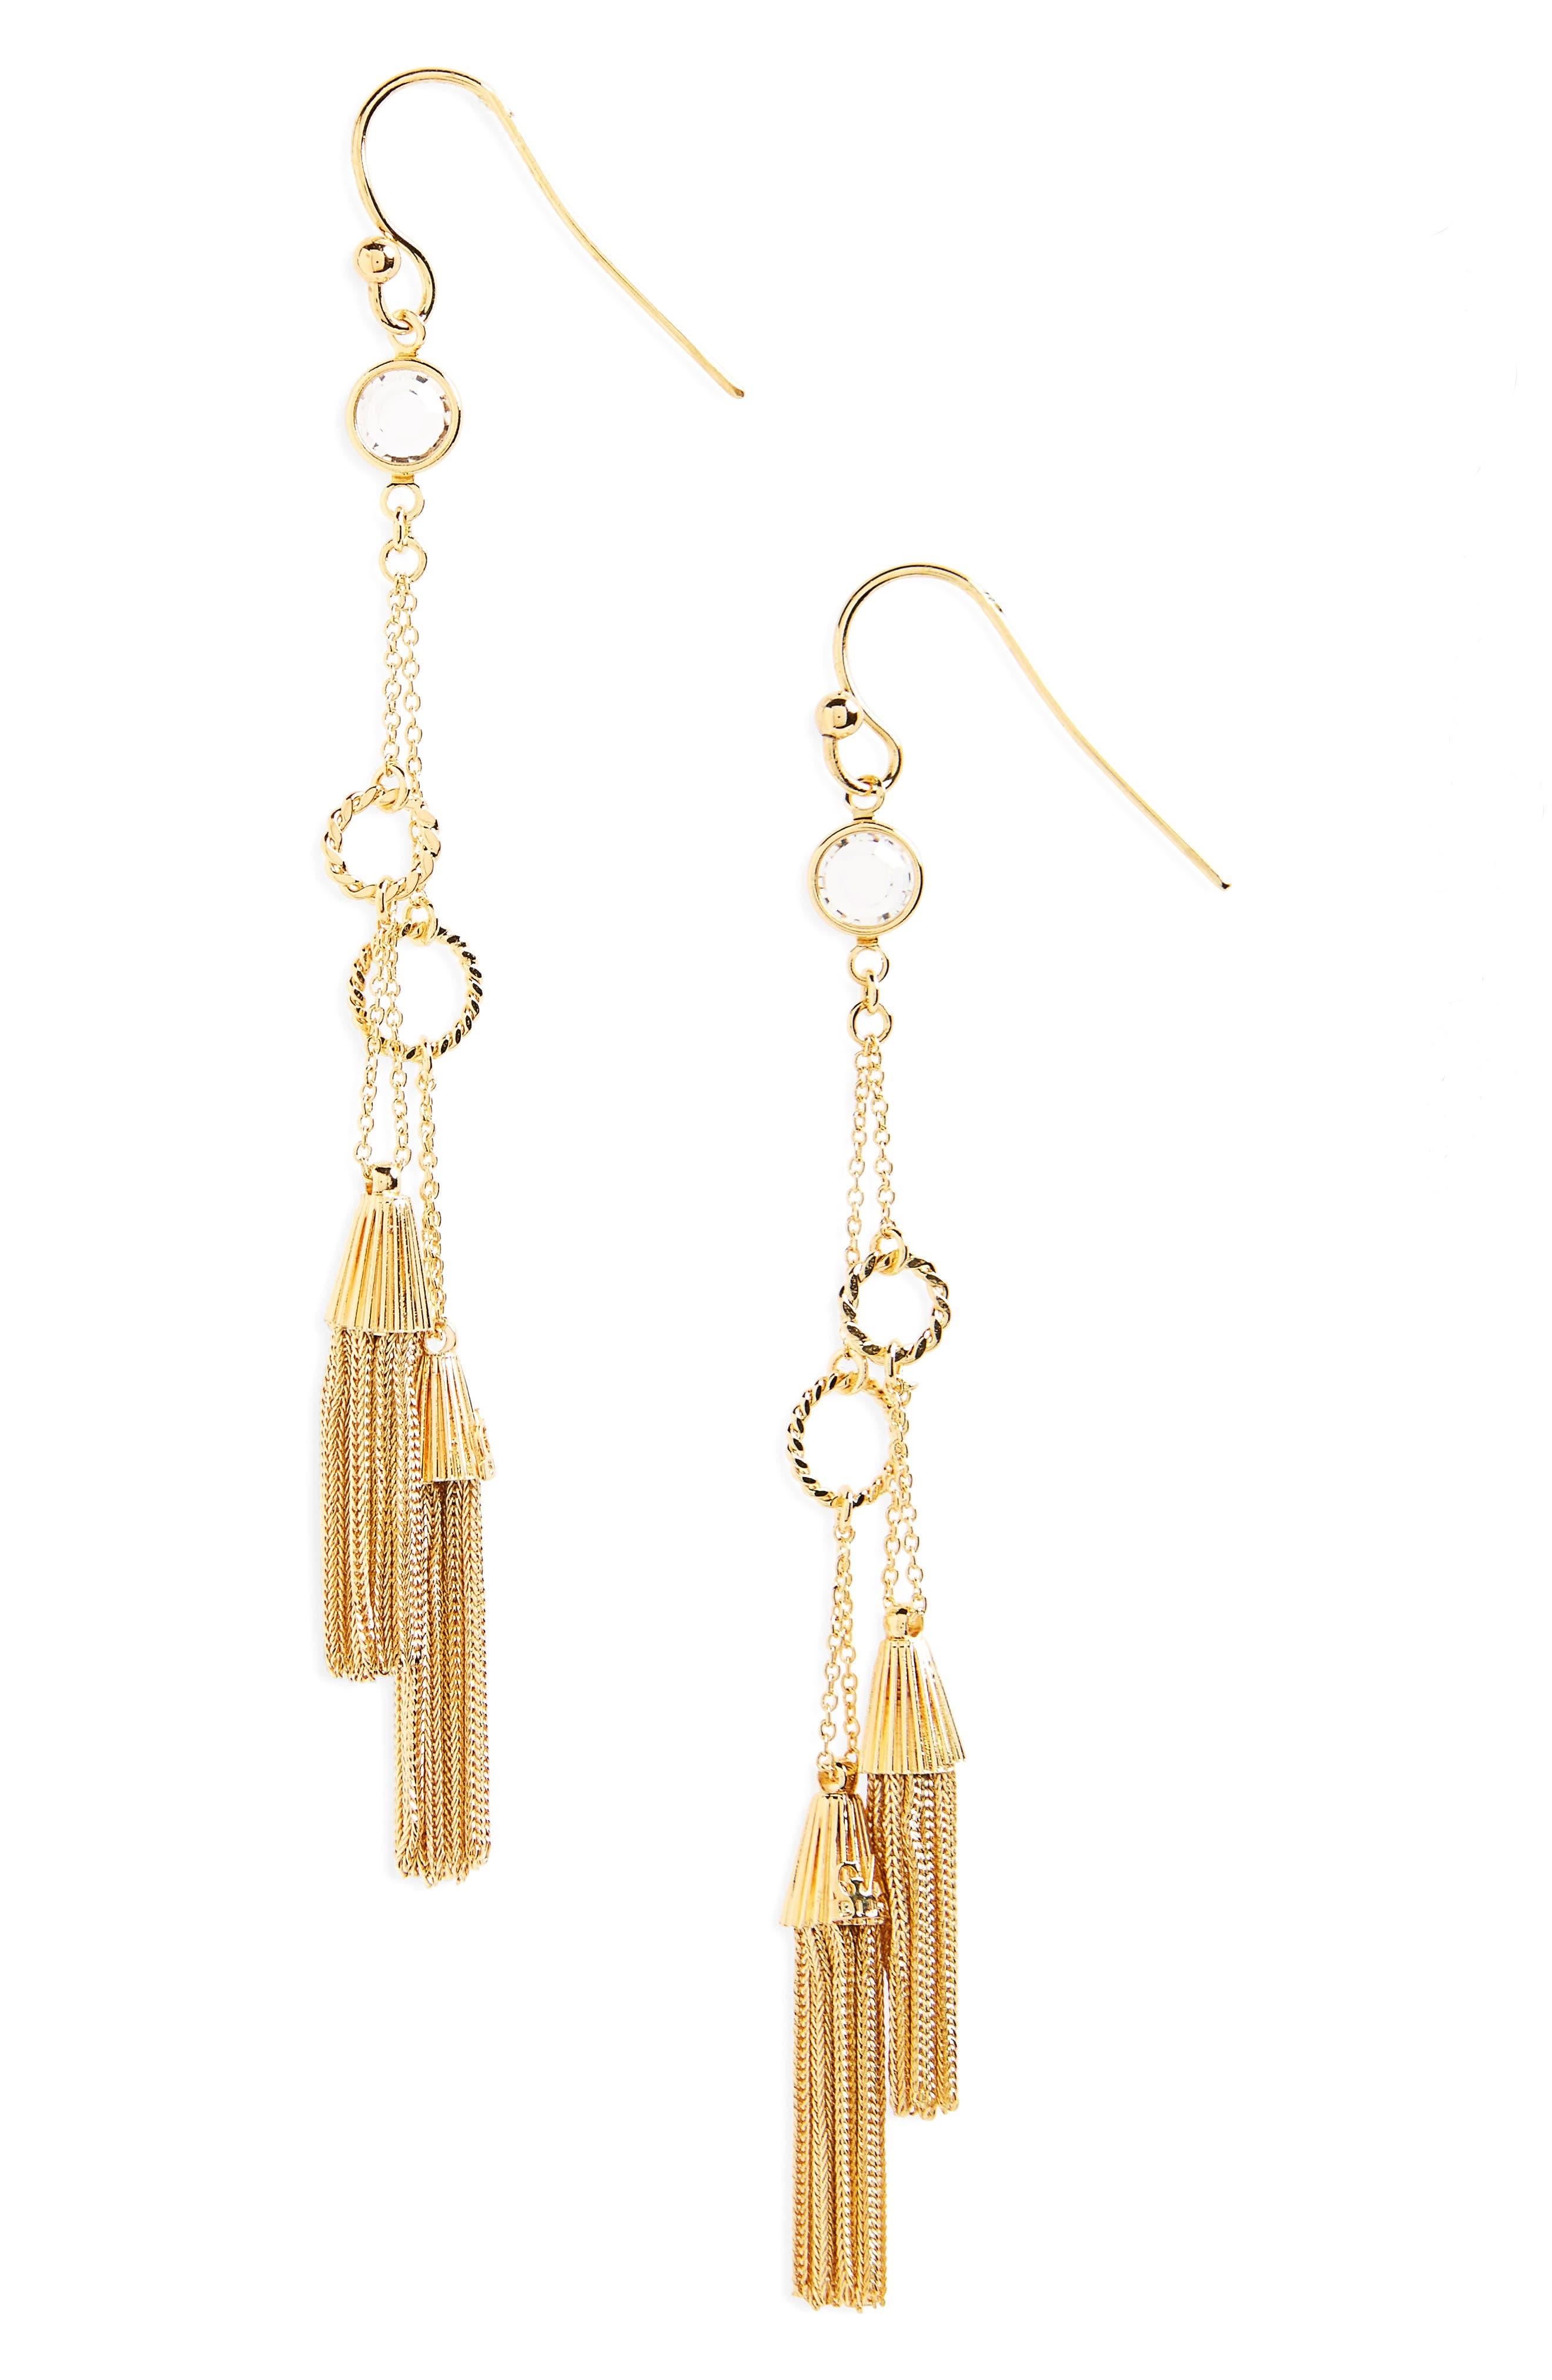 Tresse Tassels Shoulder Duster Earrings,                         Main,                         color, 710